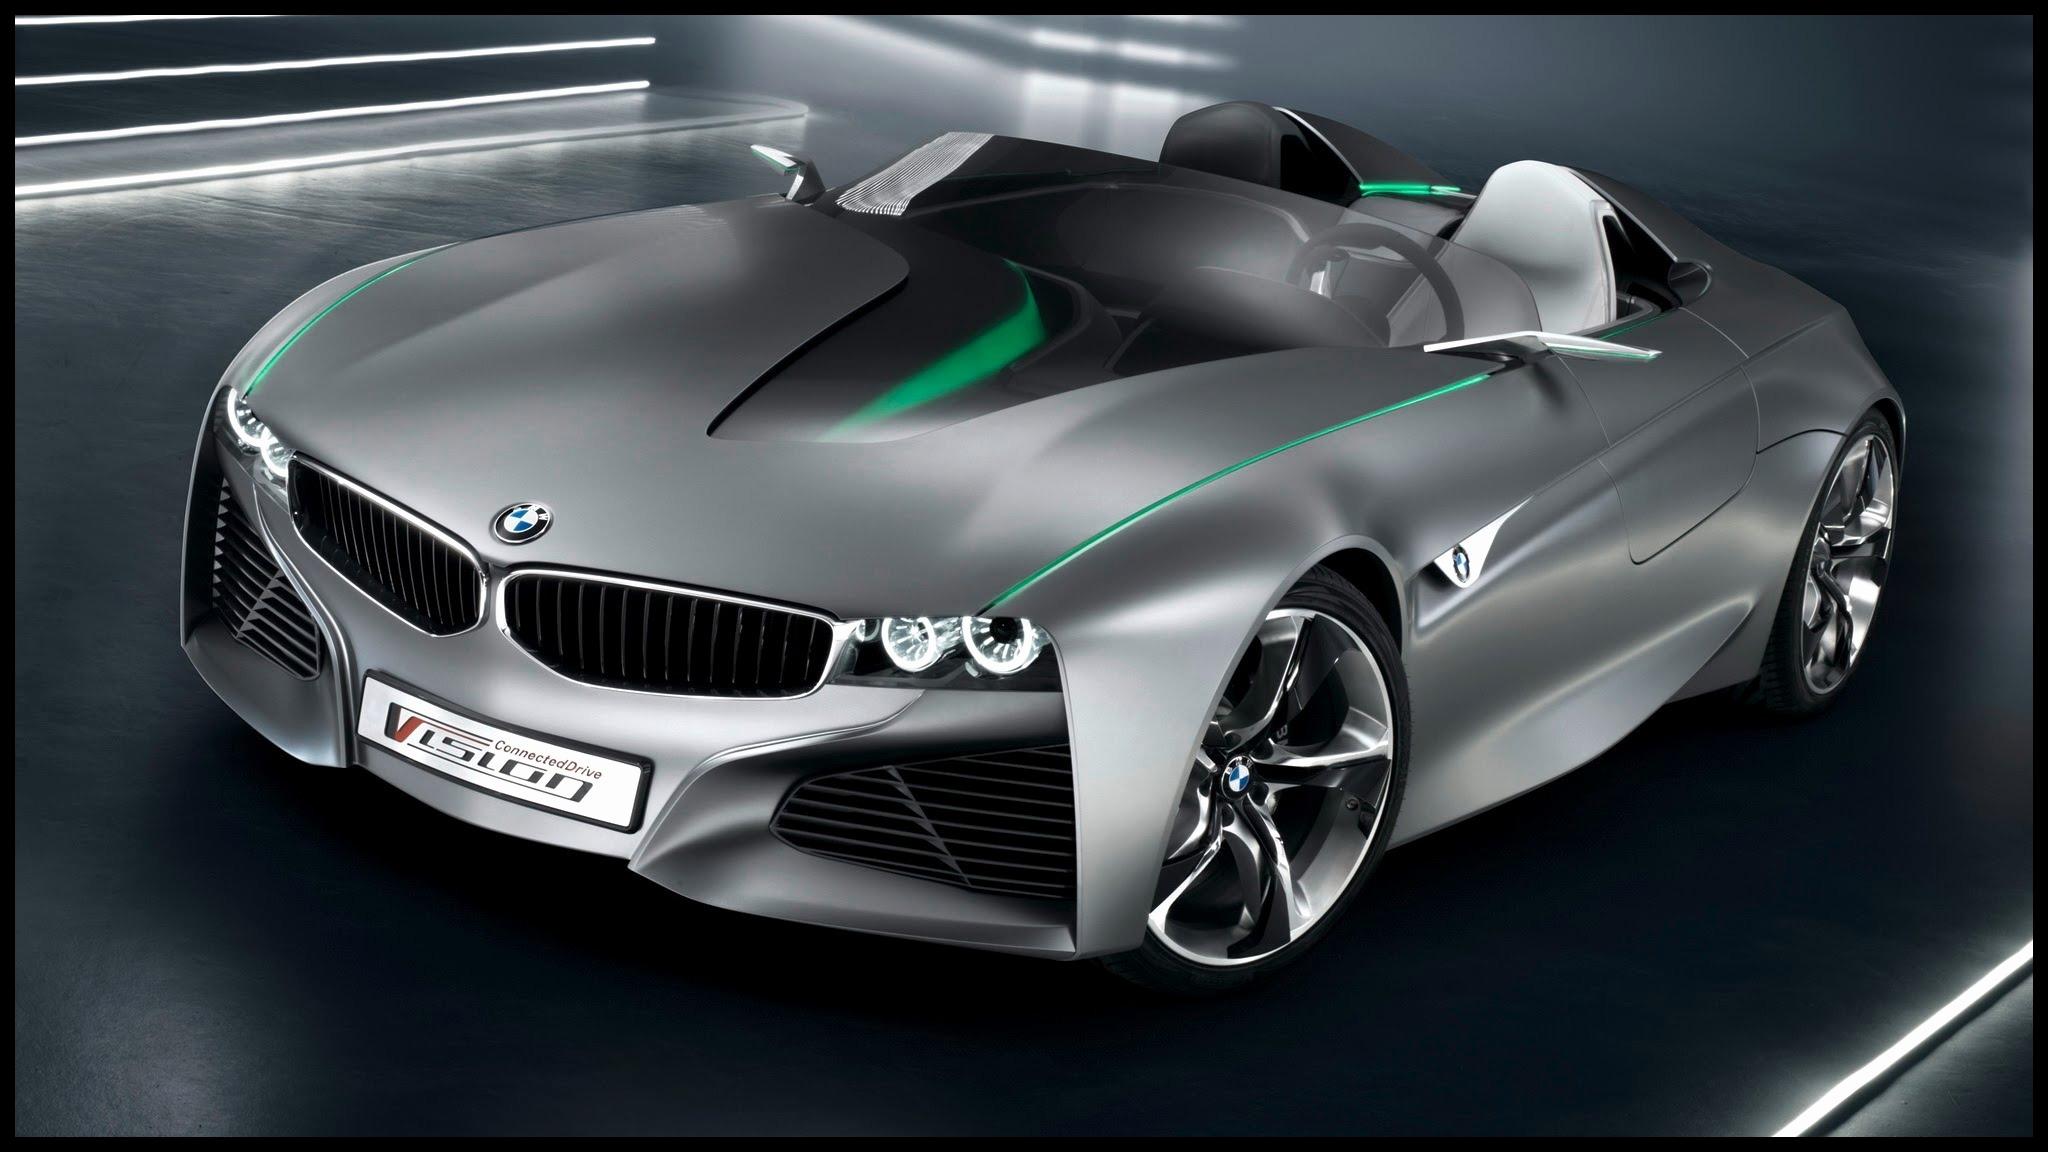 New Bmw Sports Car ing soon Best Luxury Bmw New Vision Drive Car 2015